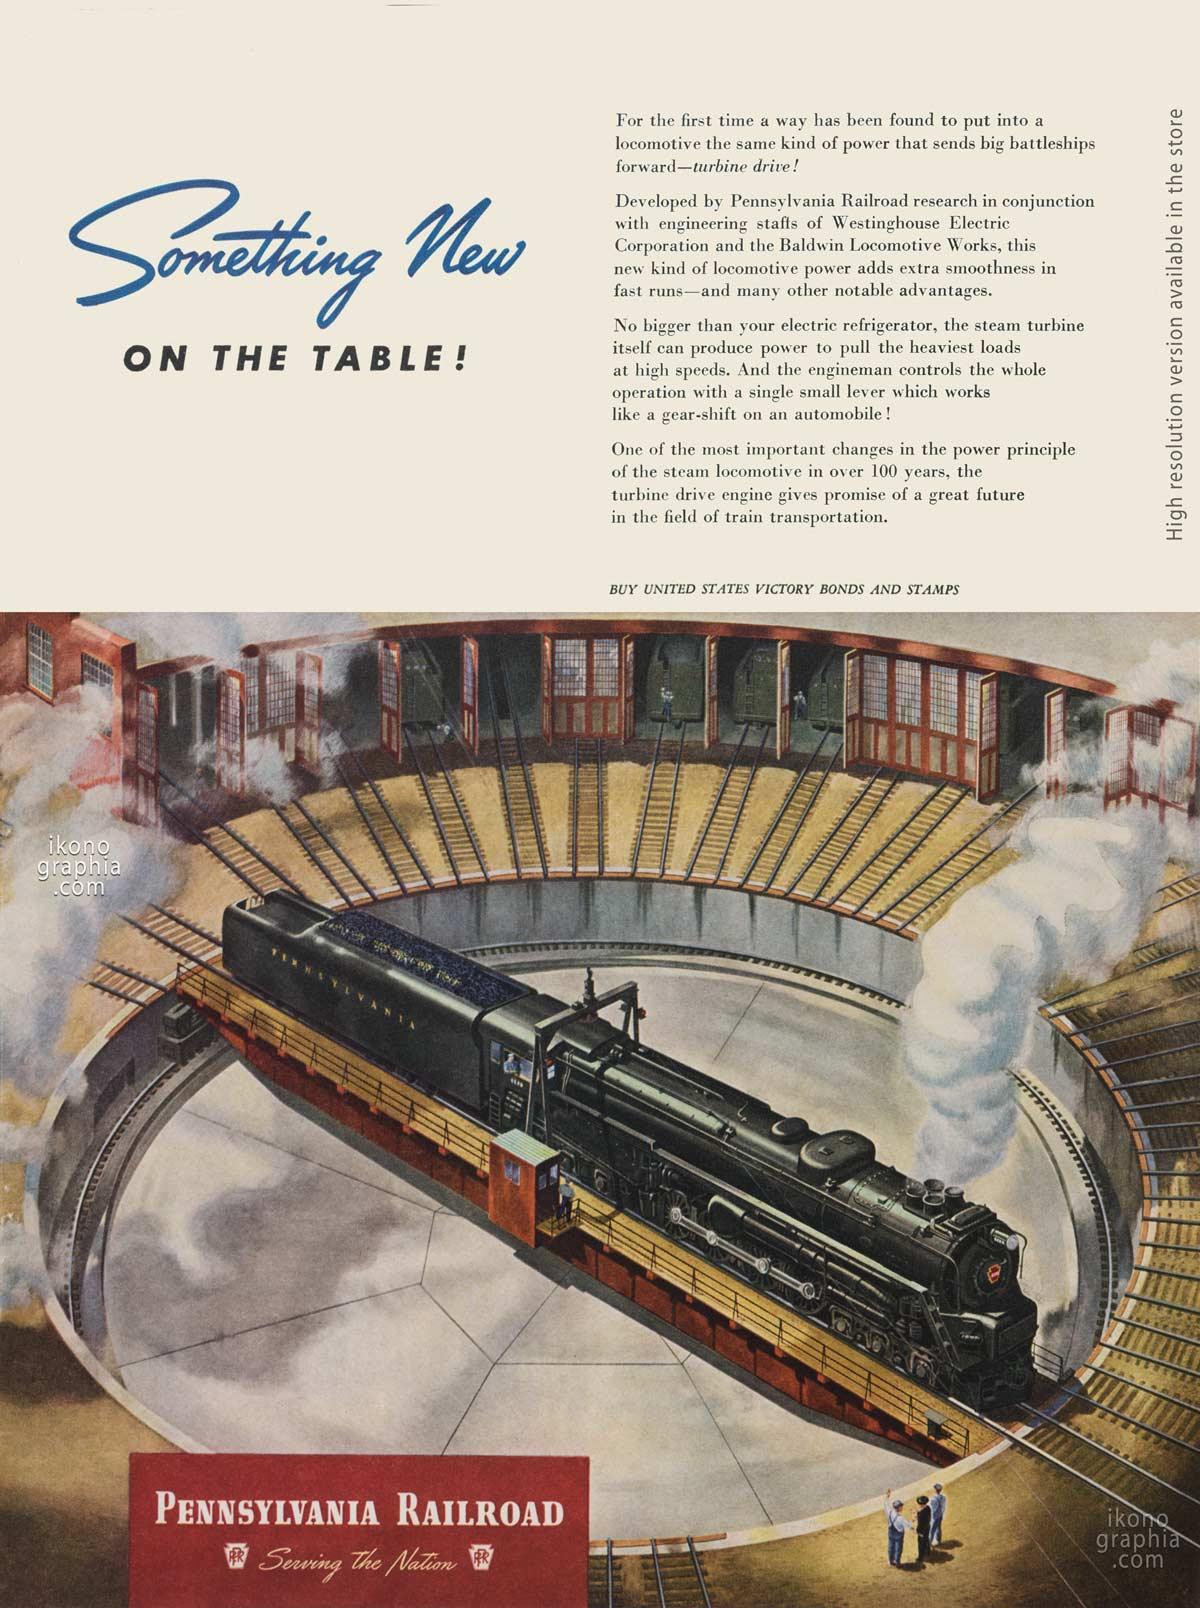 Something New on the table! - Pennsylvania Railroad ad - Life Magazine. December 3, 1945